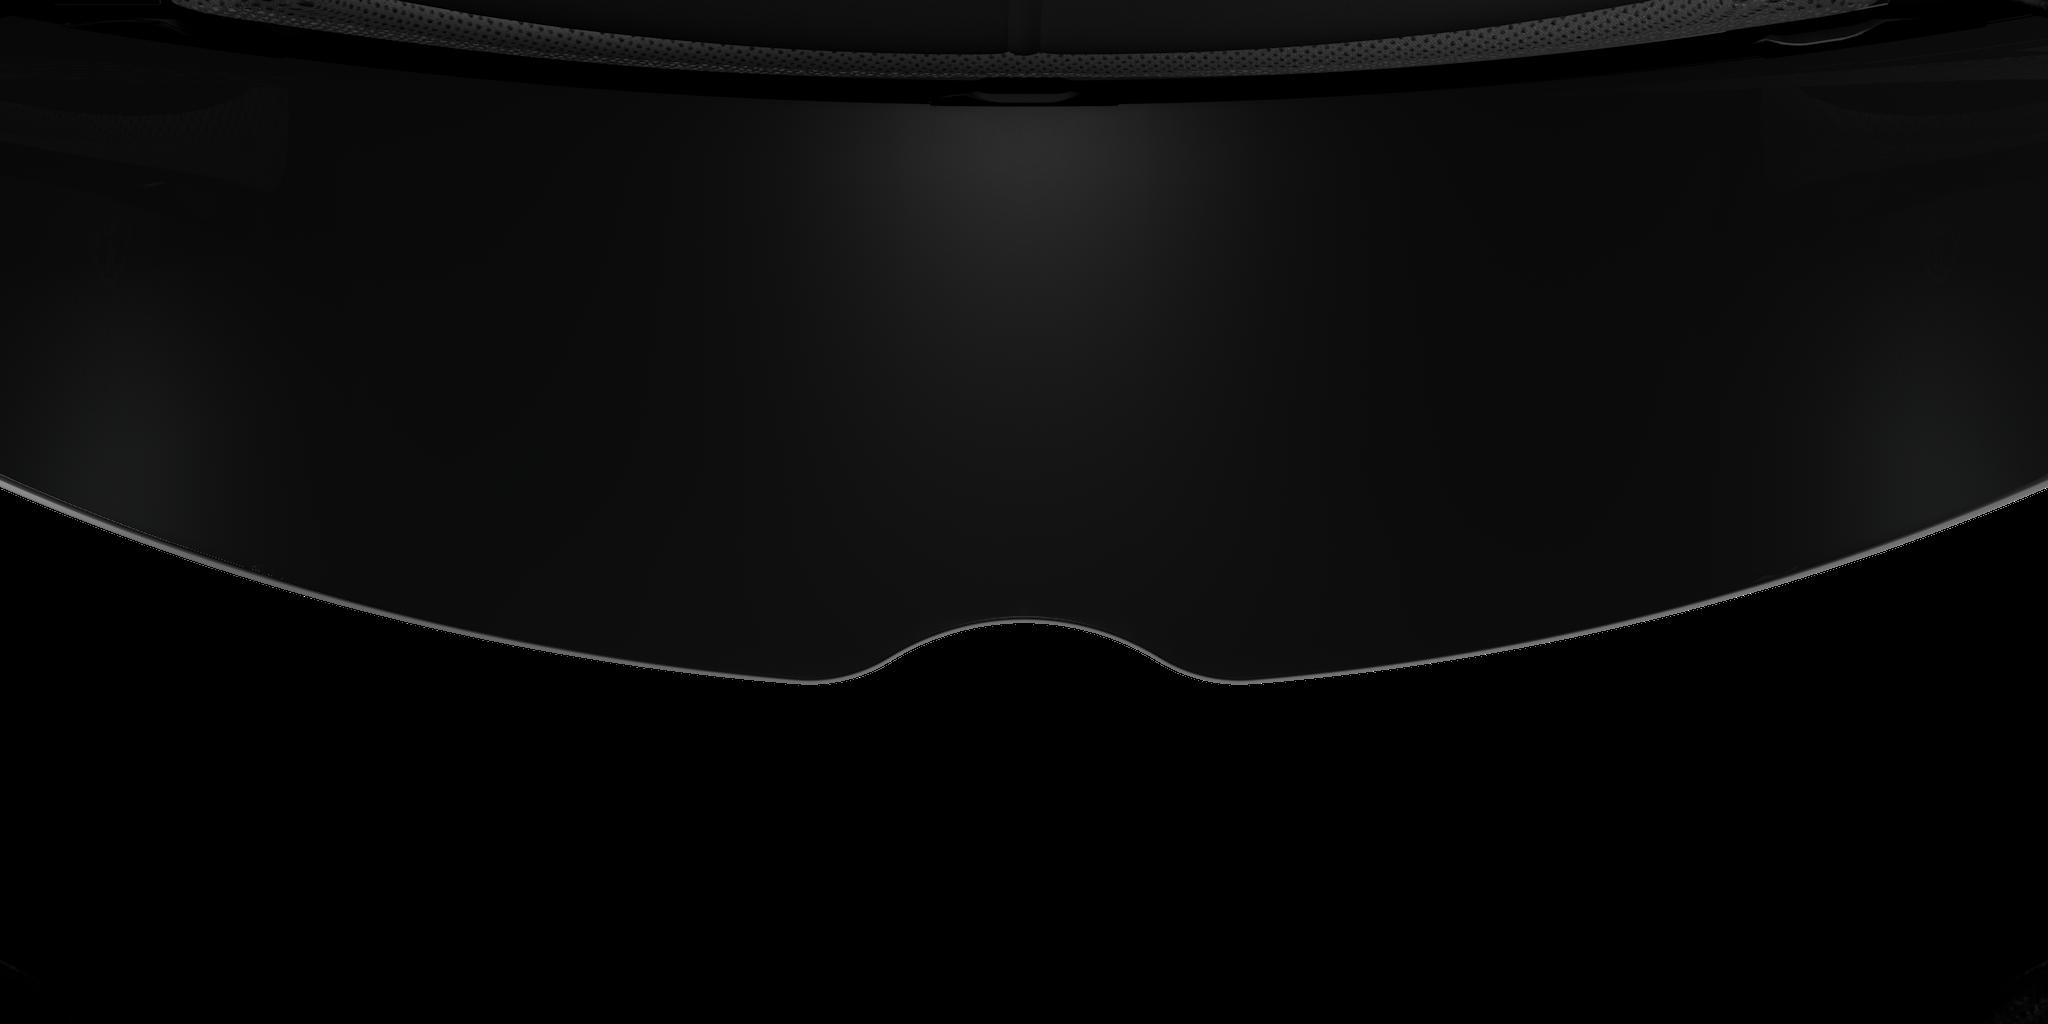 Sun visor clipart clip transparent download BMW Motorrad International : Equipment : System 7 Carbon clip transparent download